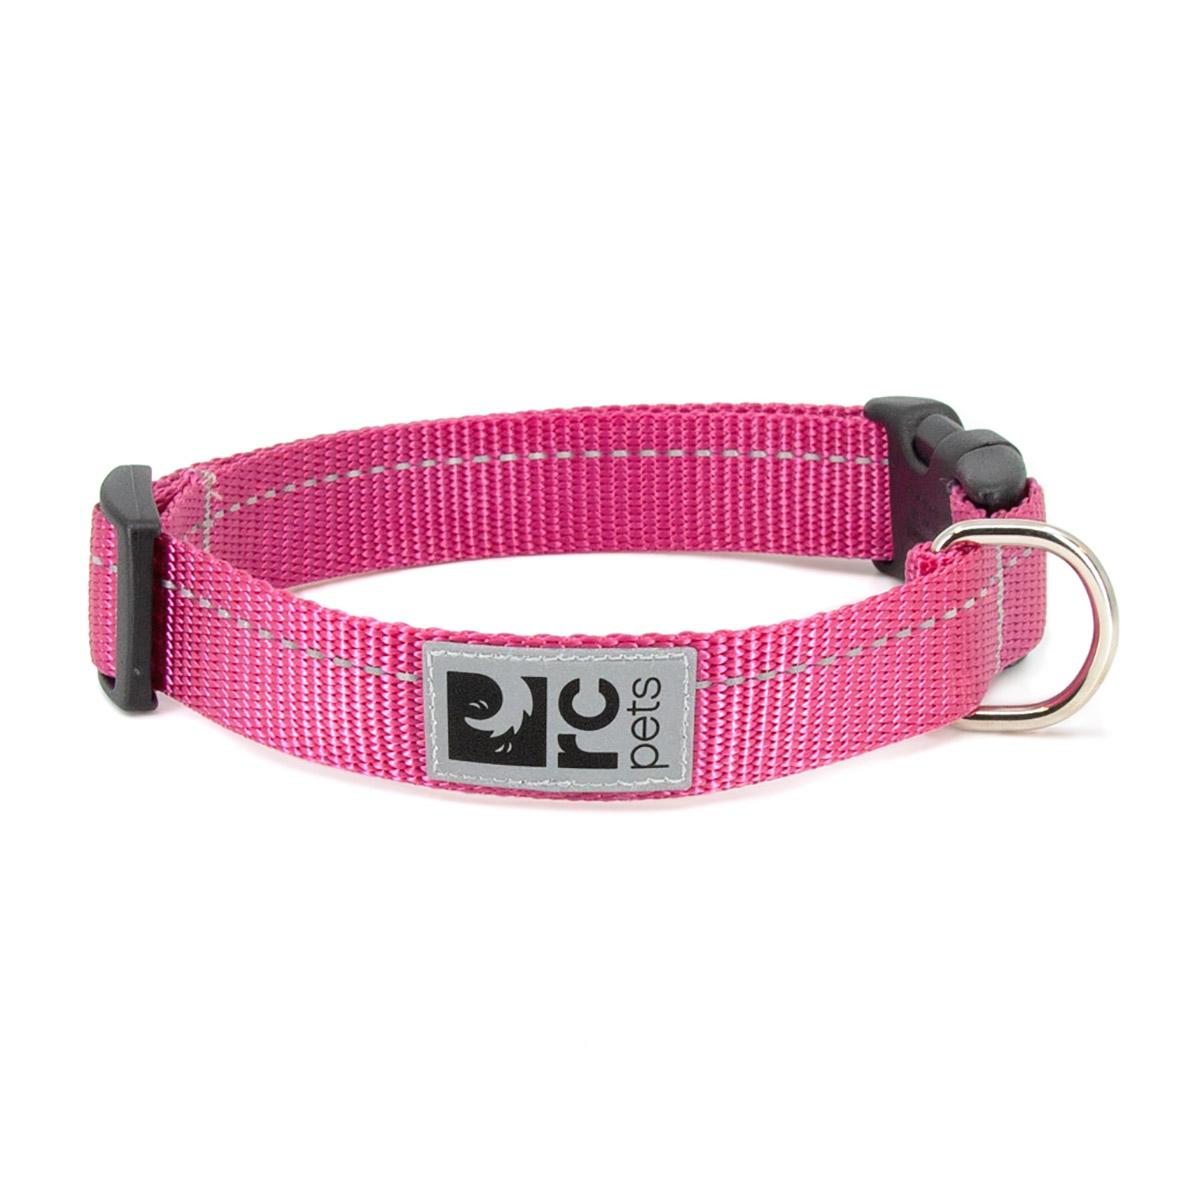 Primary Clip Dog Collar - Raspberry